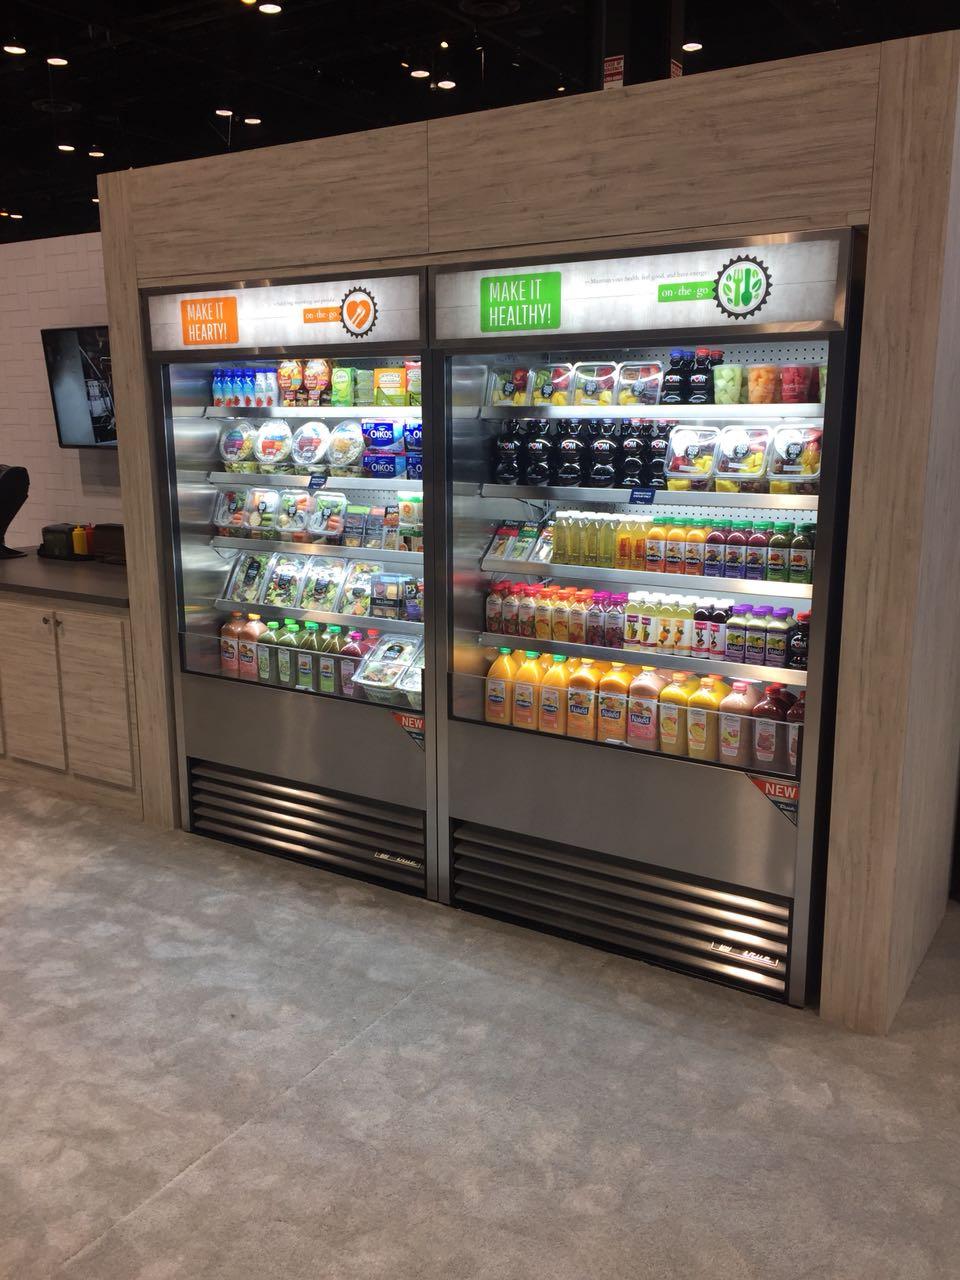 Stand True Refrigeration